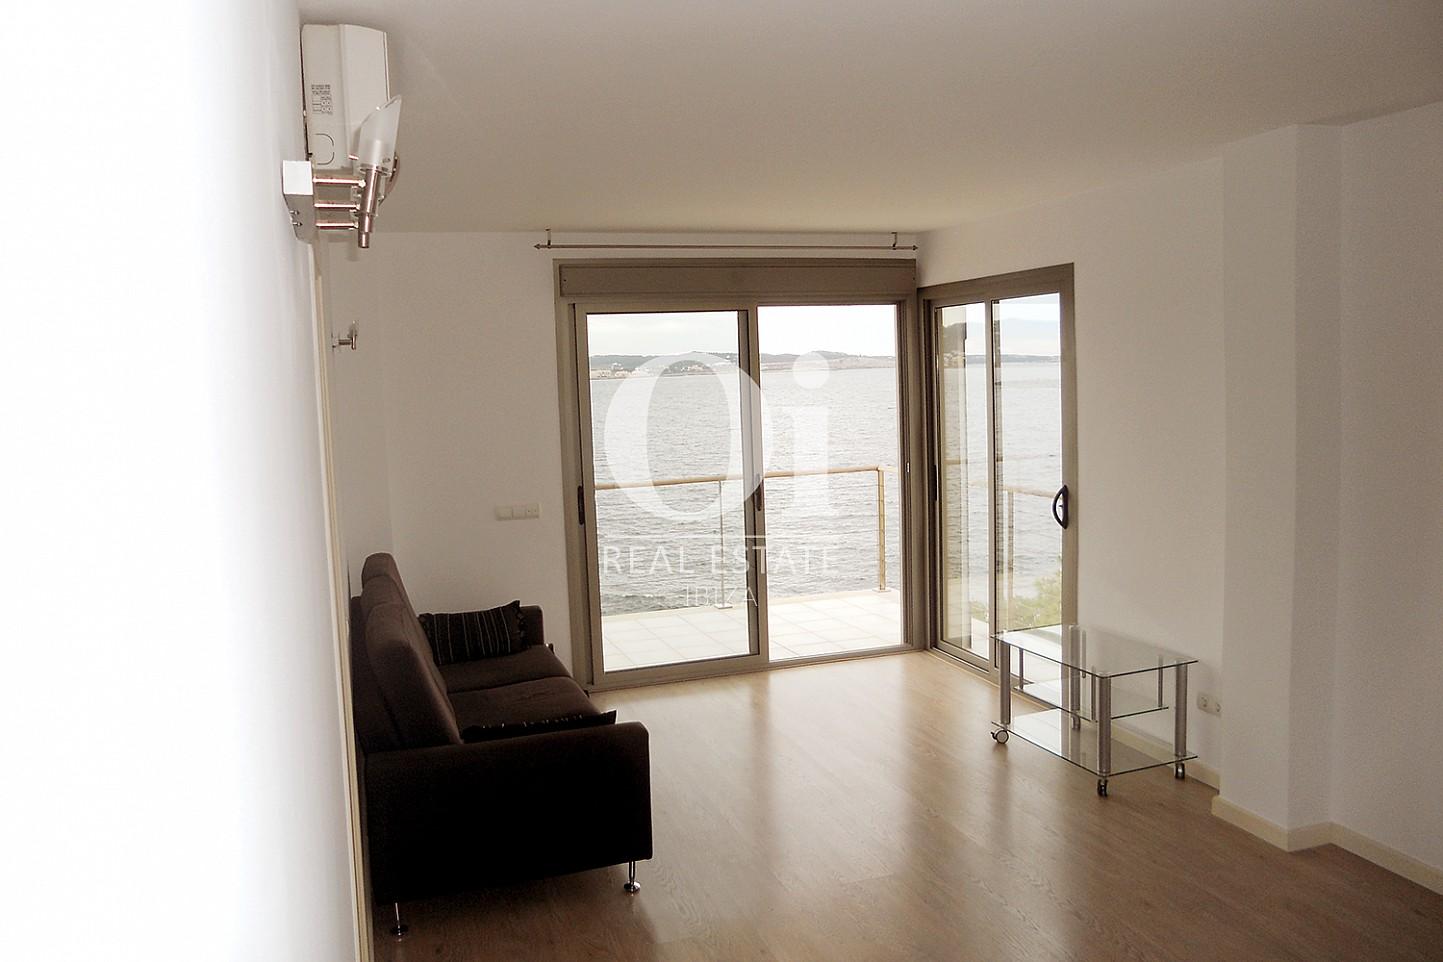 Sala de estar de piso en venta en Cala Gració, zona de Sant Antoni, Ibiza